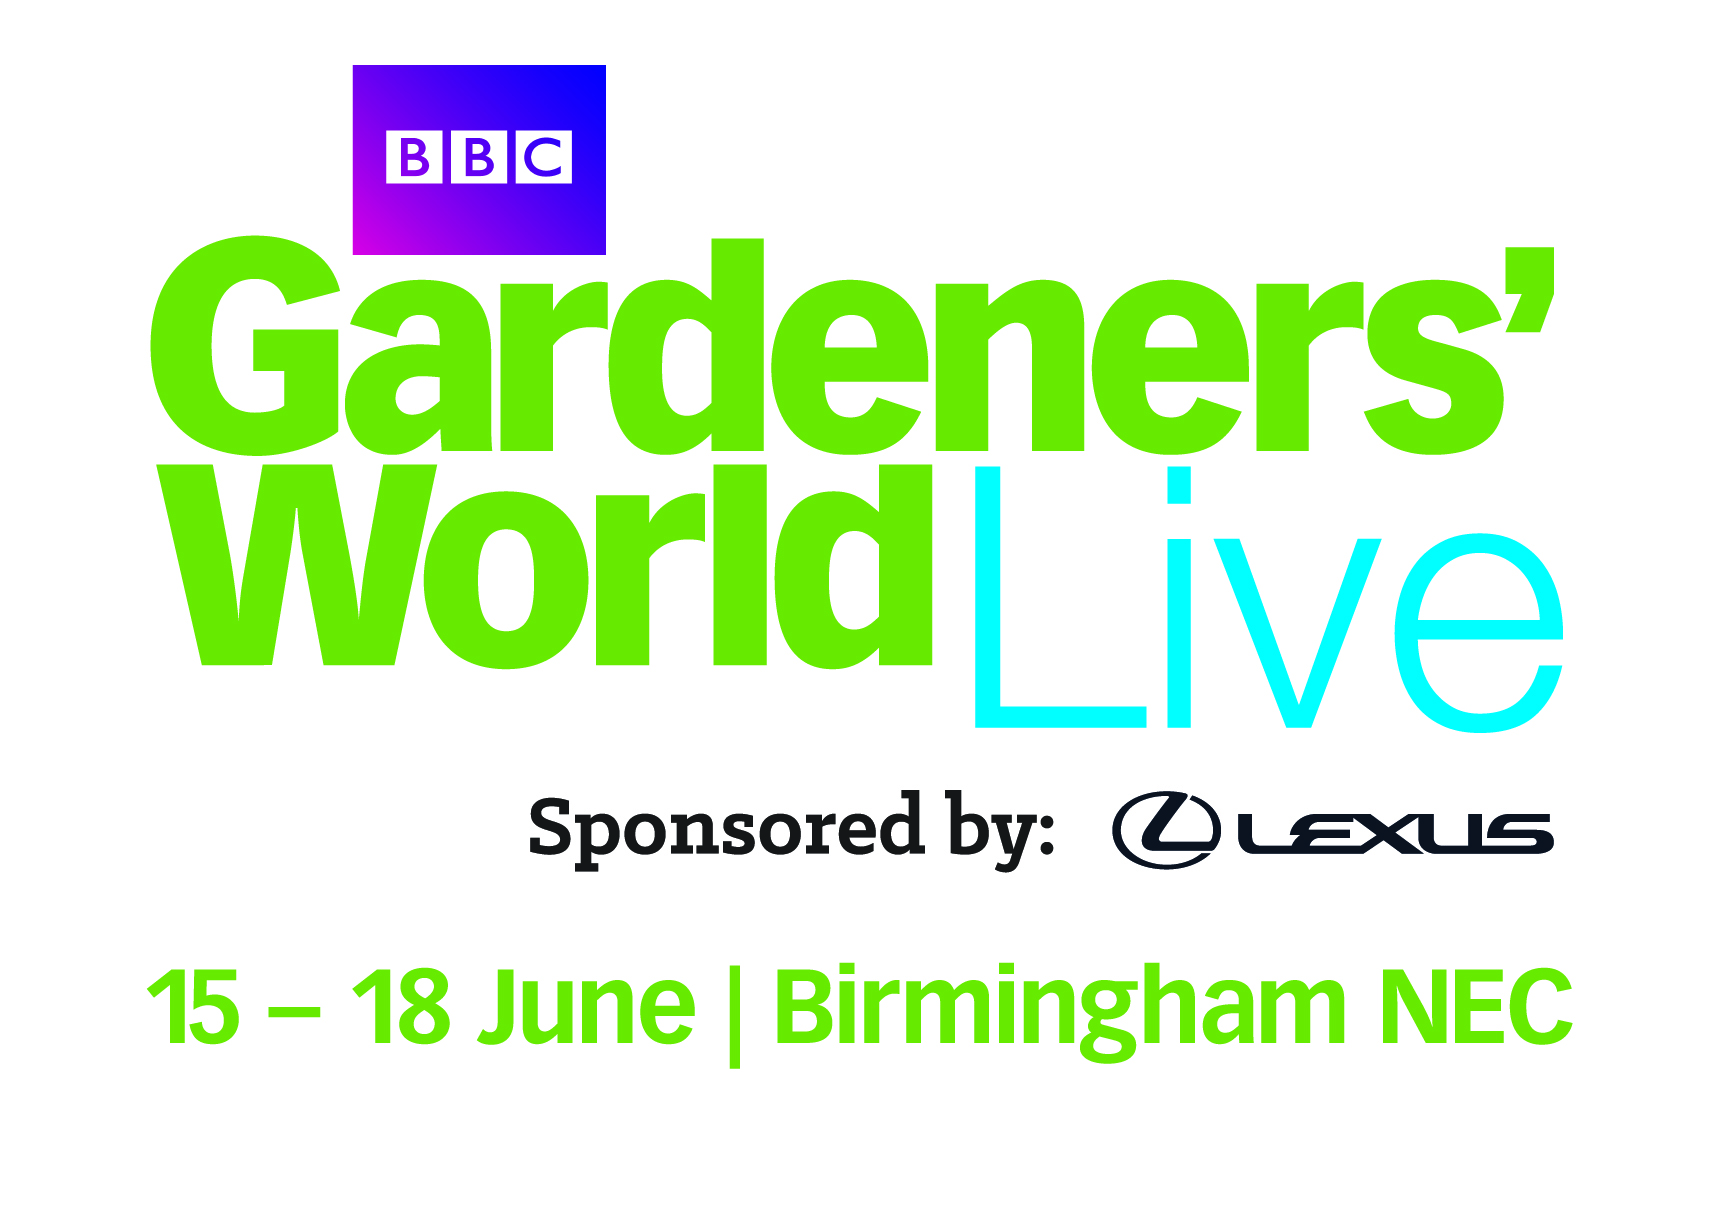 bbc-gardeners-world-live-3